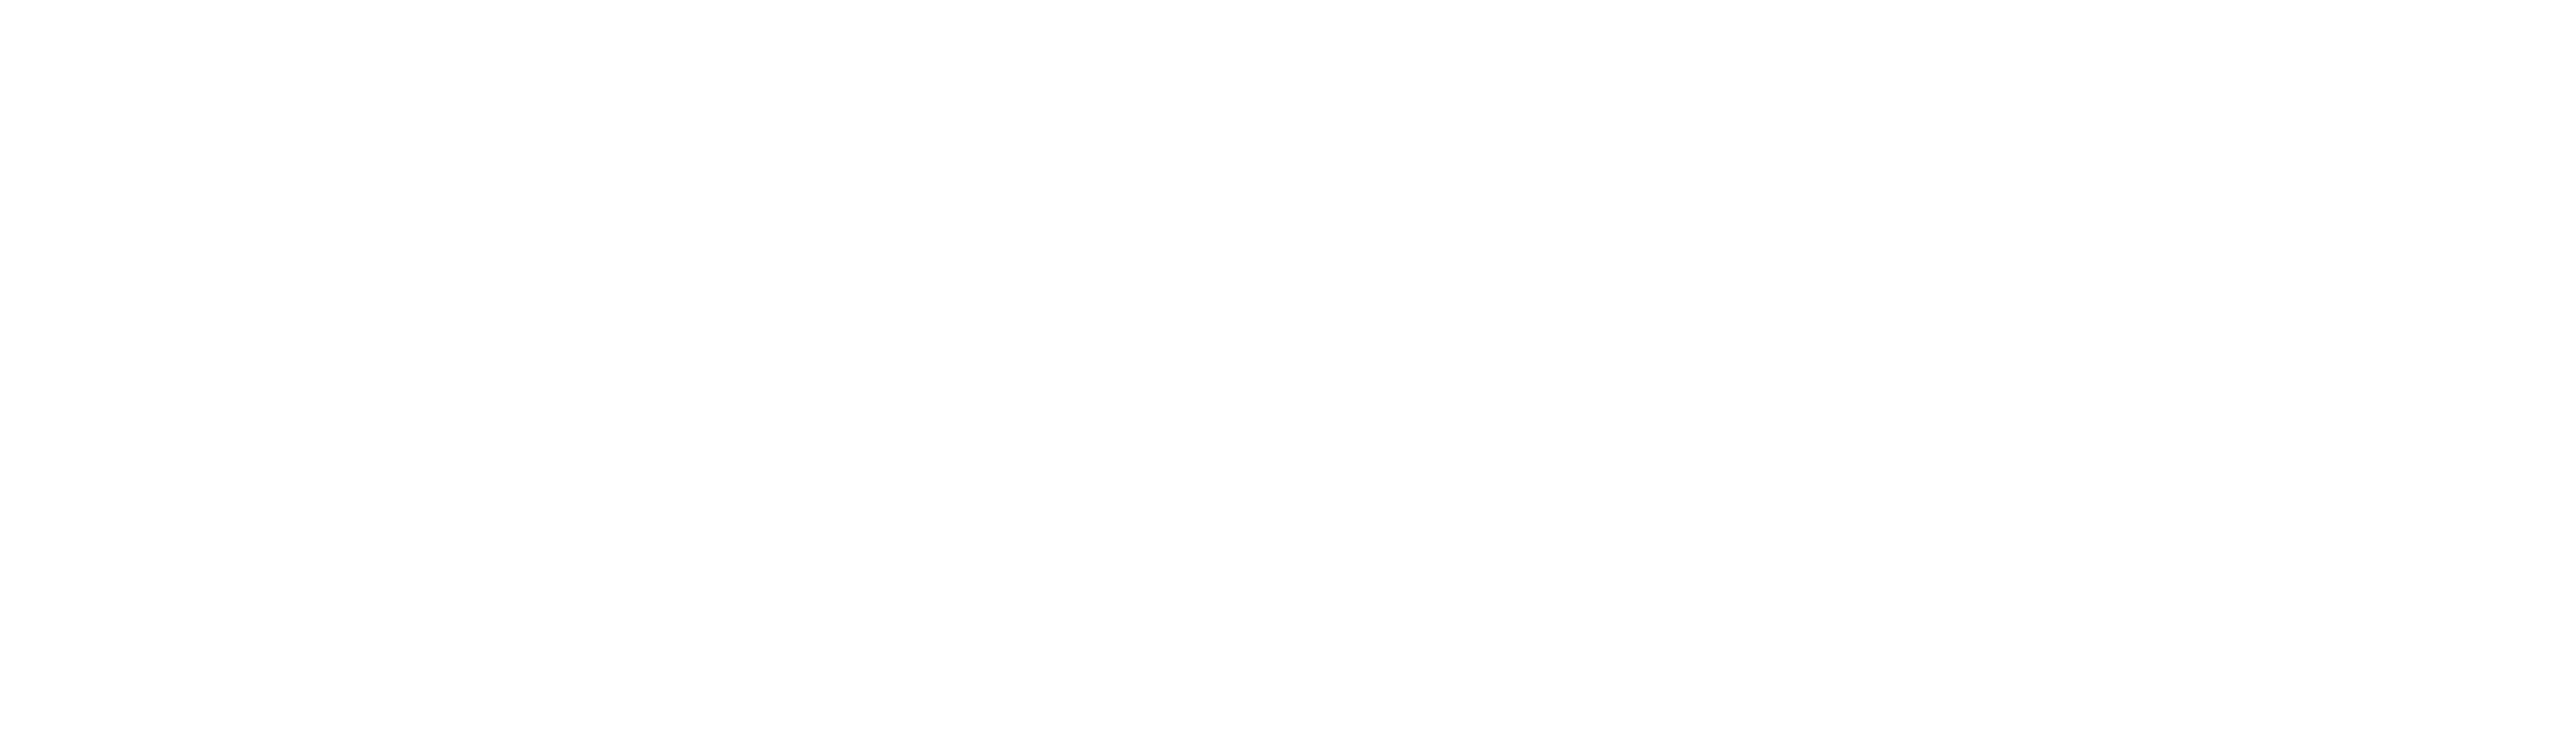 Nexapp-blank